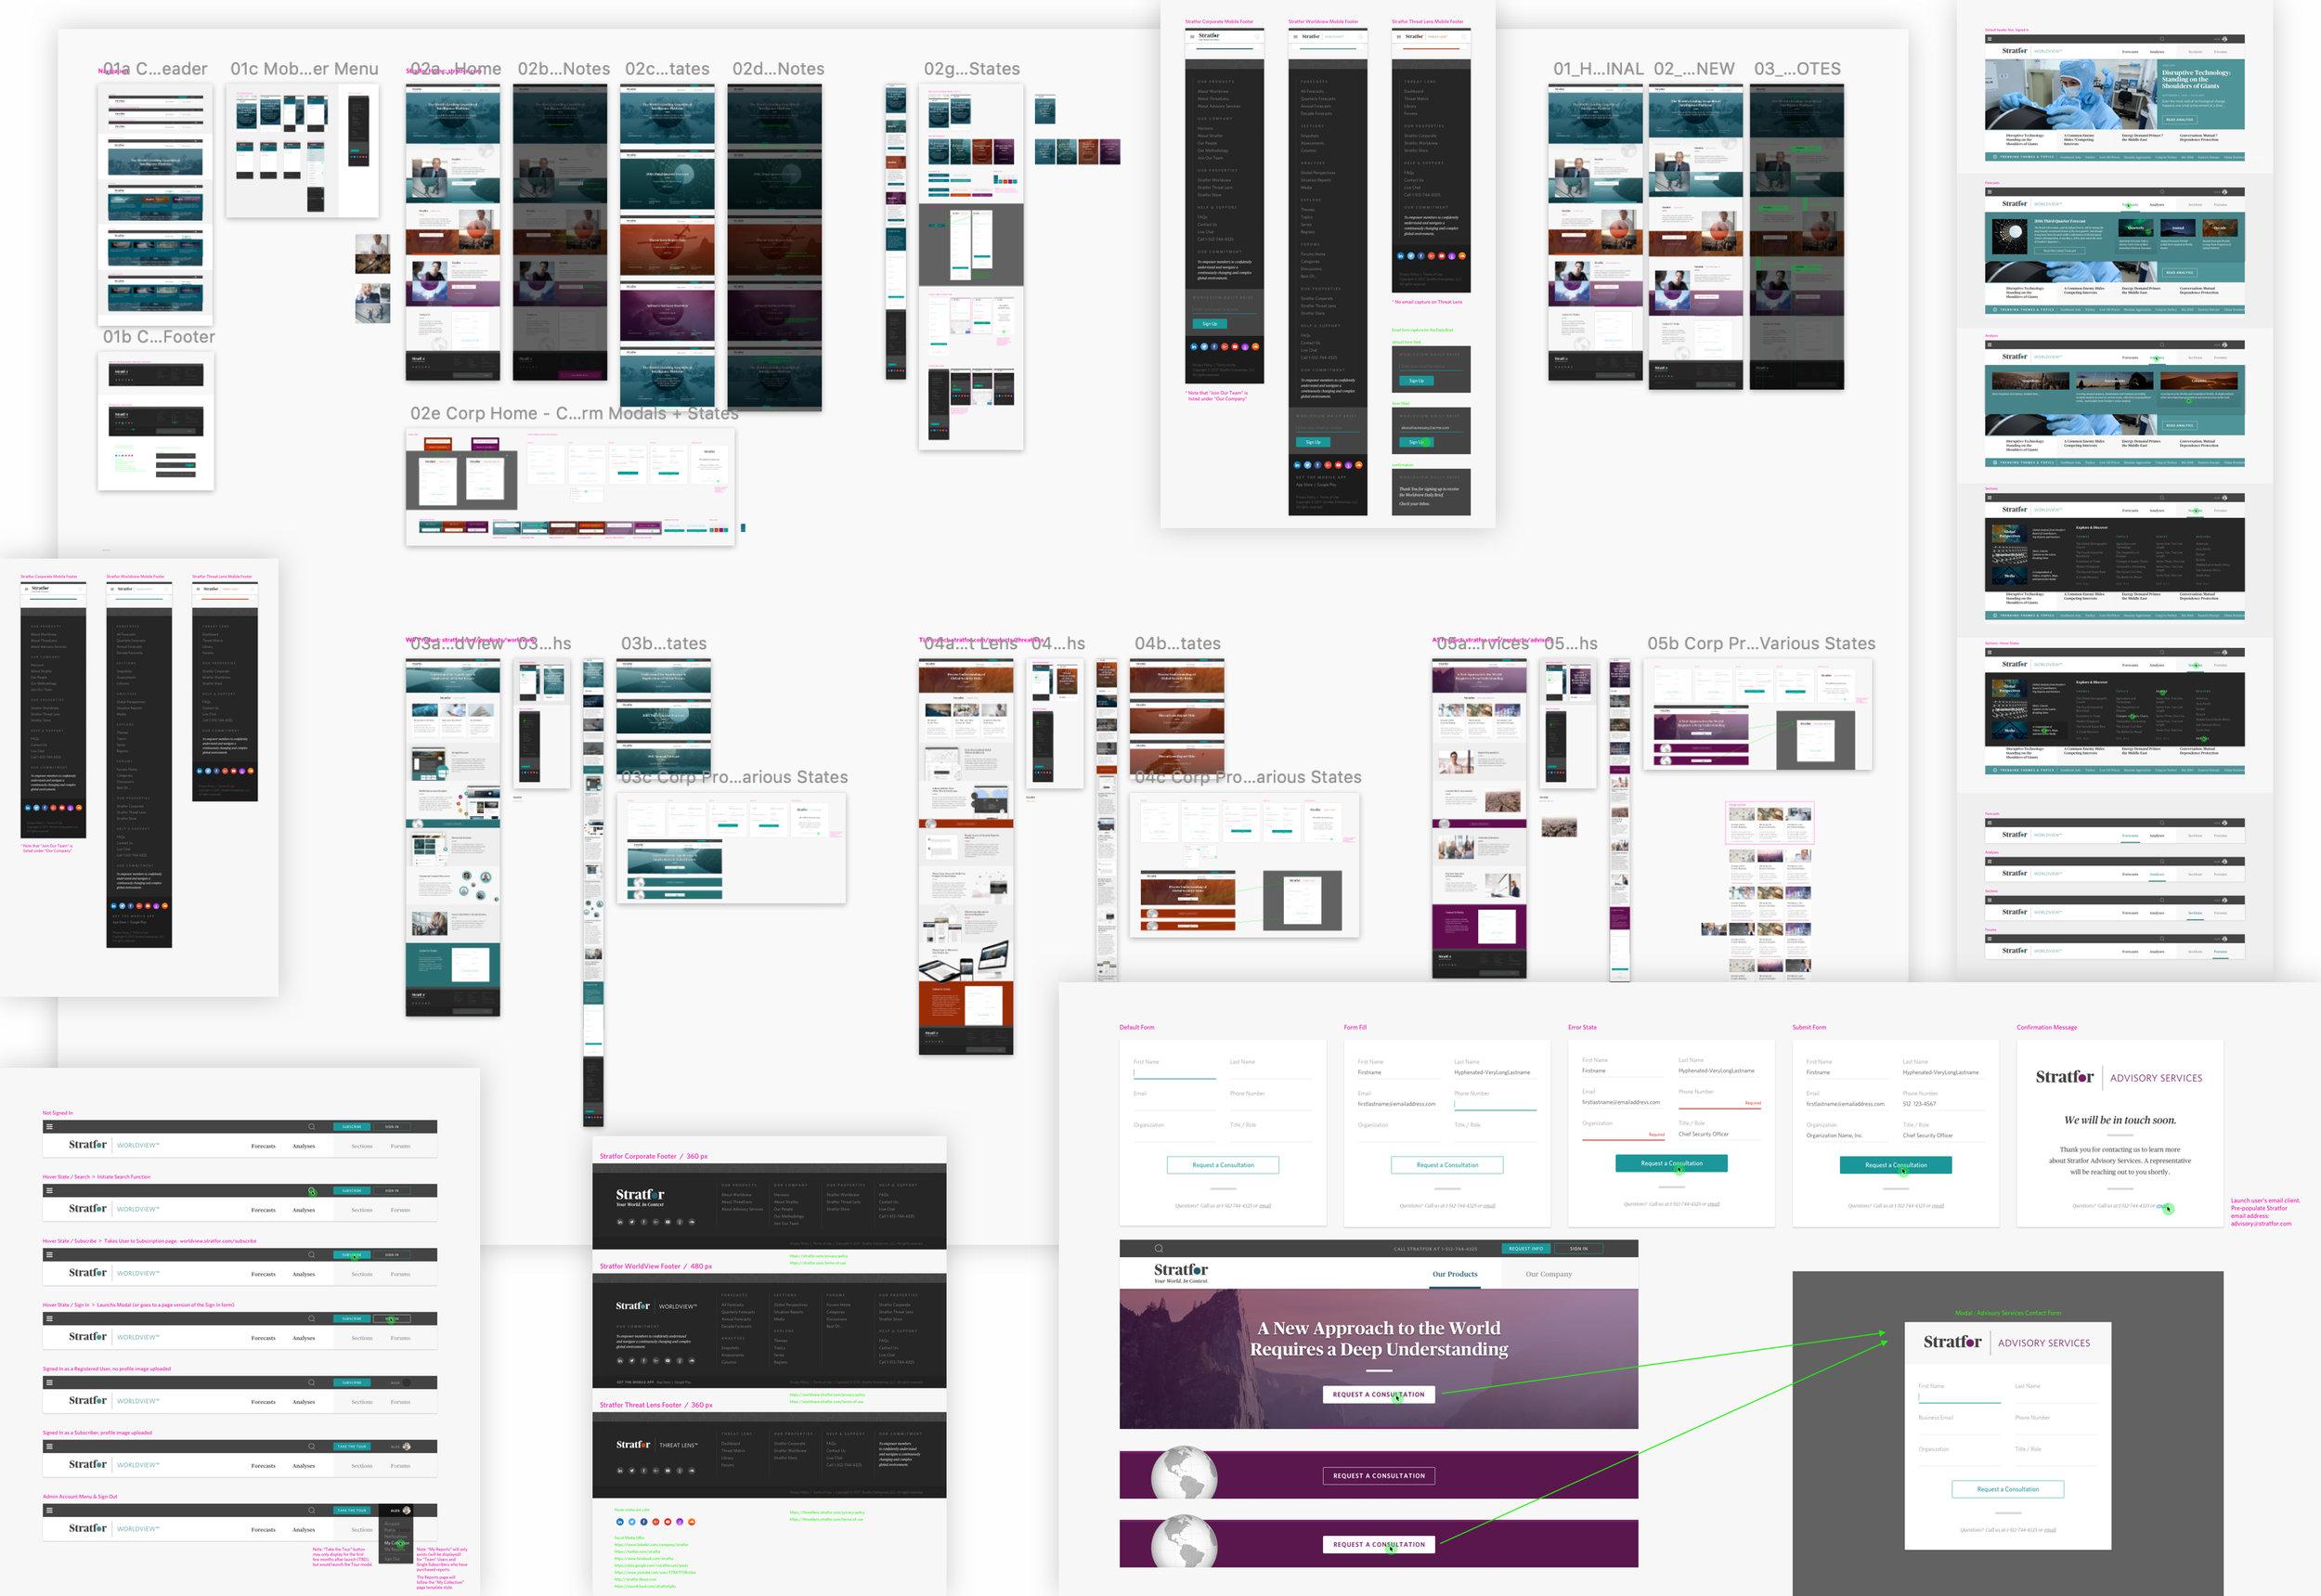 stratfor_process-flow_04@2x.jpg